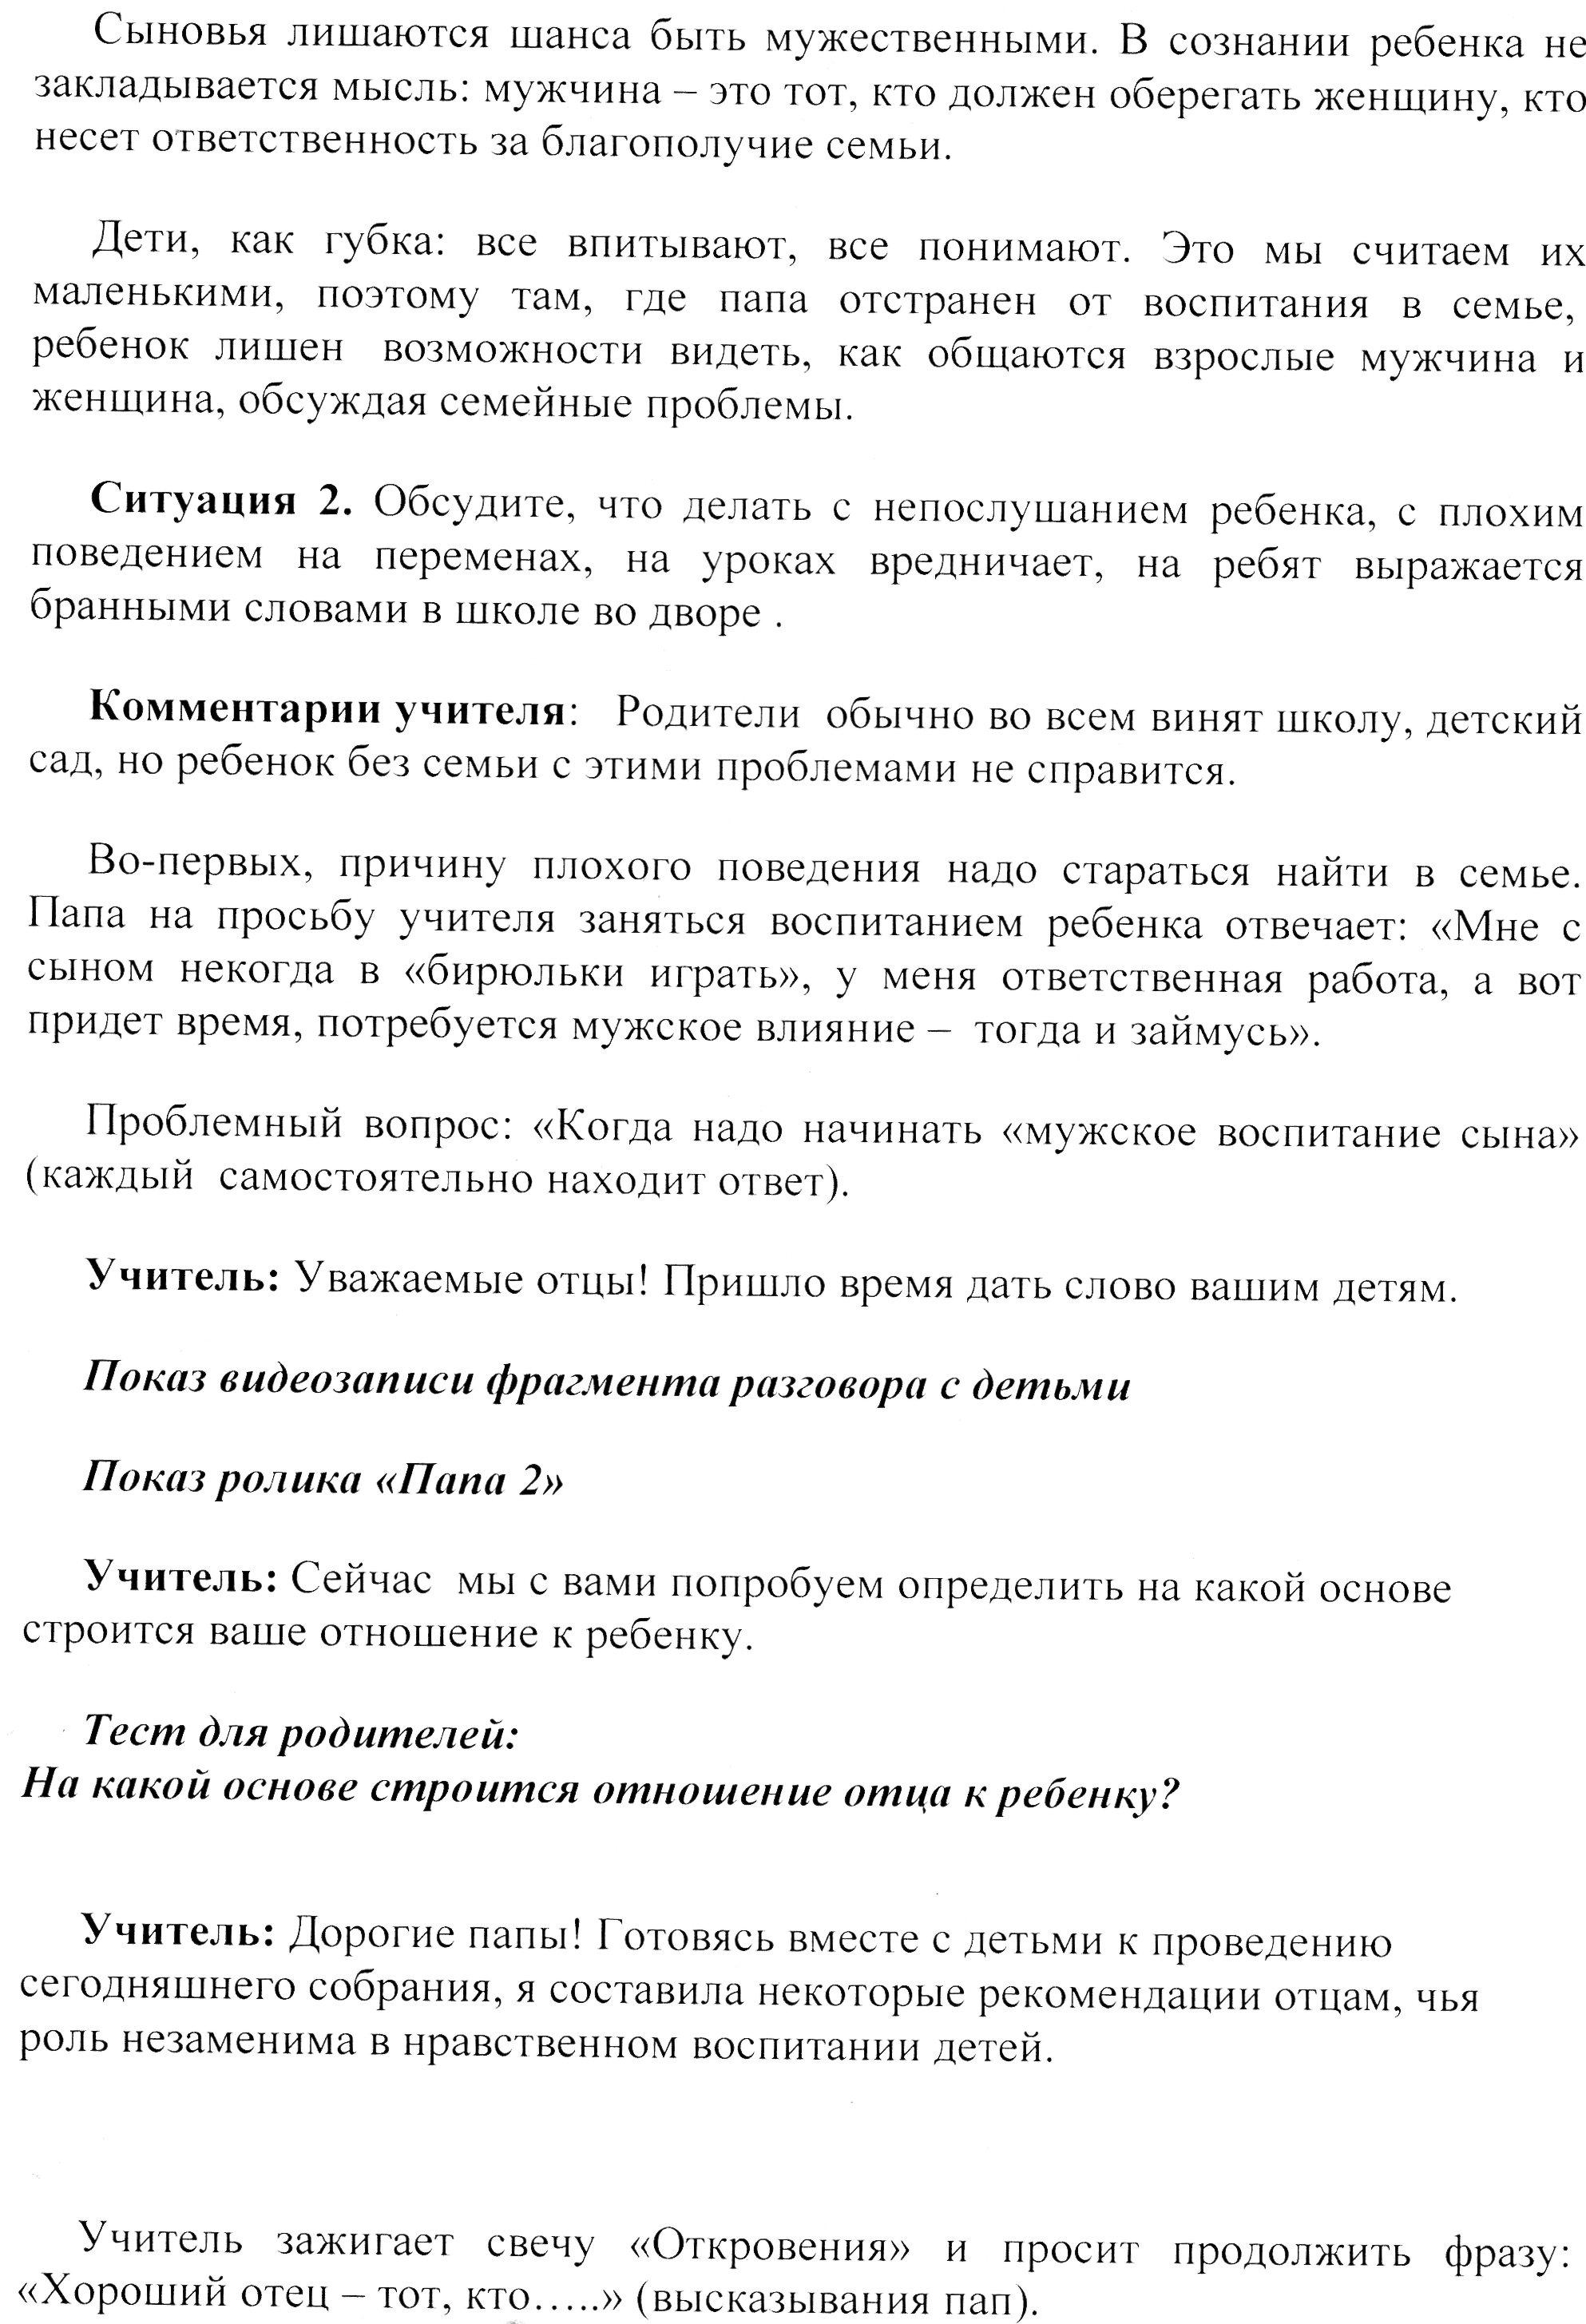 hello_html_55c0e757.jpg